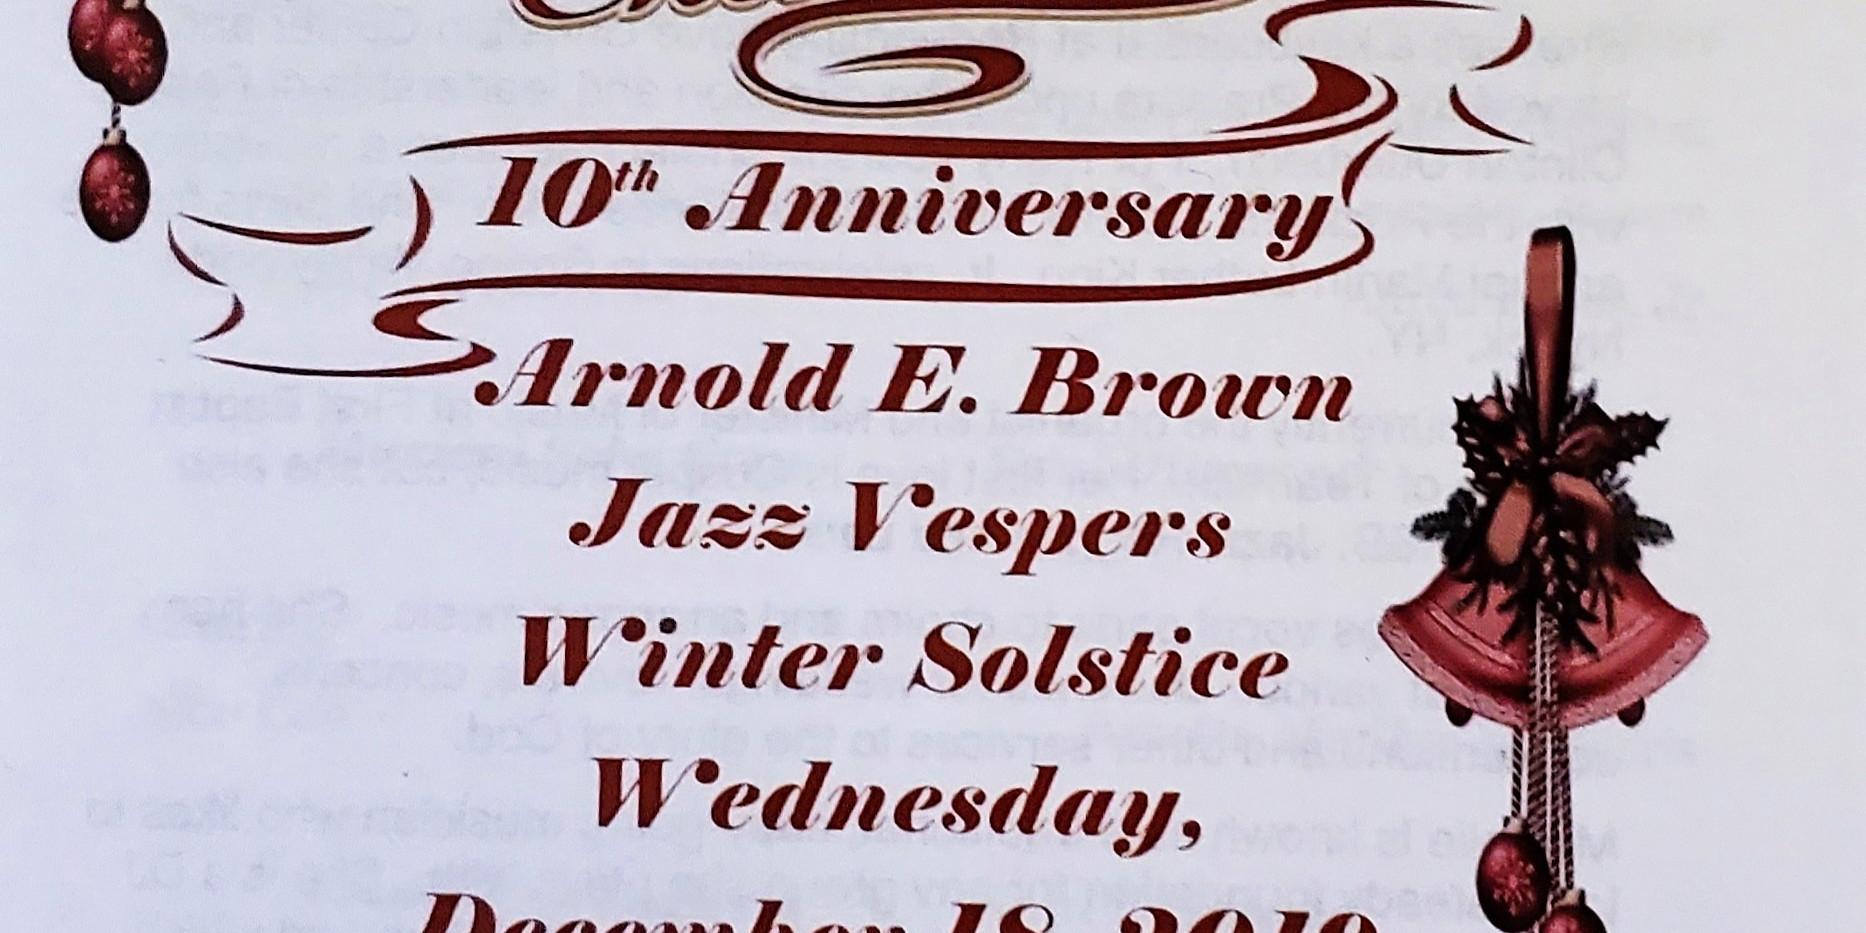 12-18-19 FBCT Jazz Vespers (1).jpg